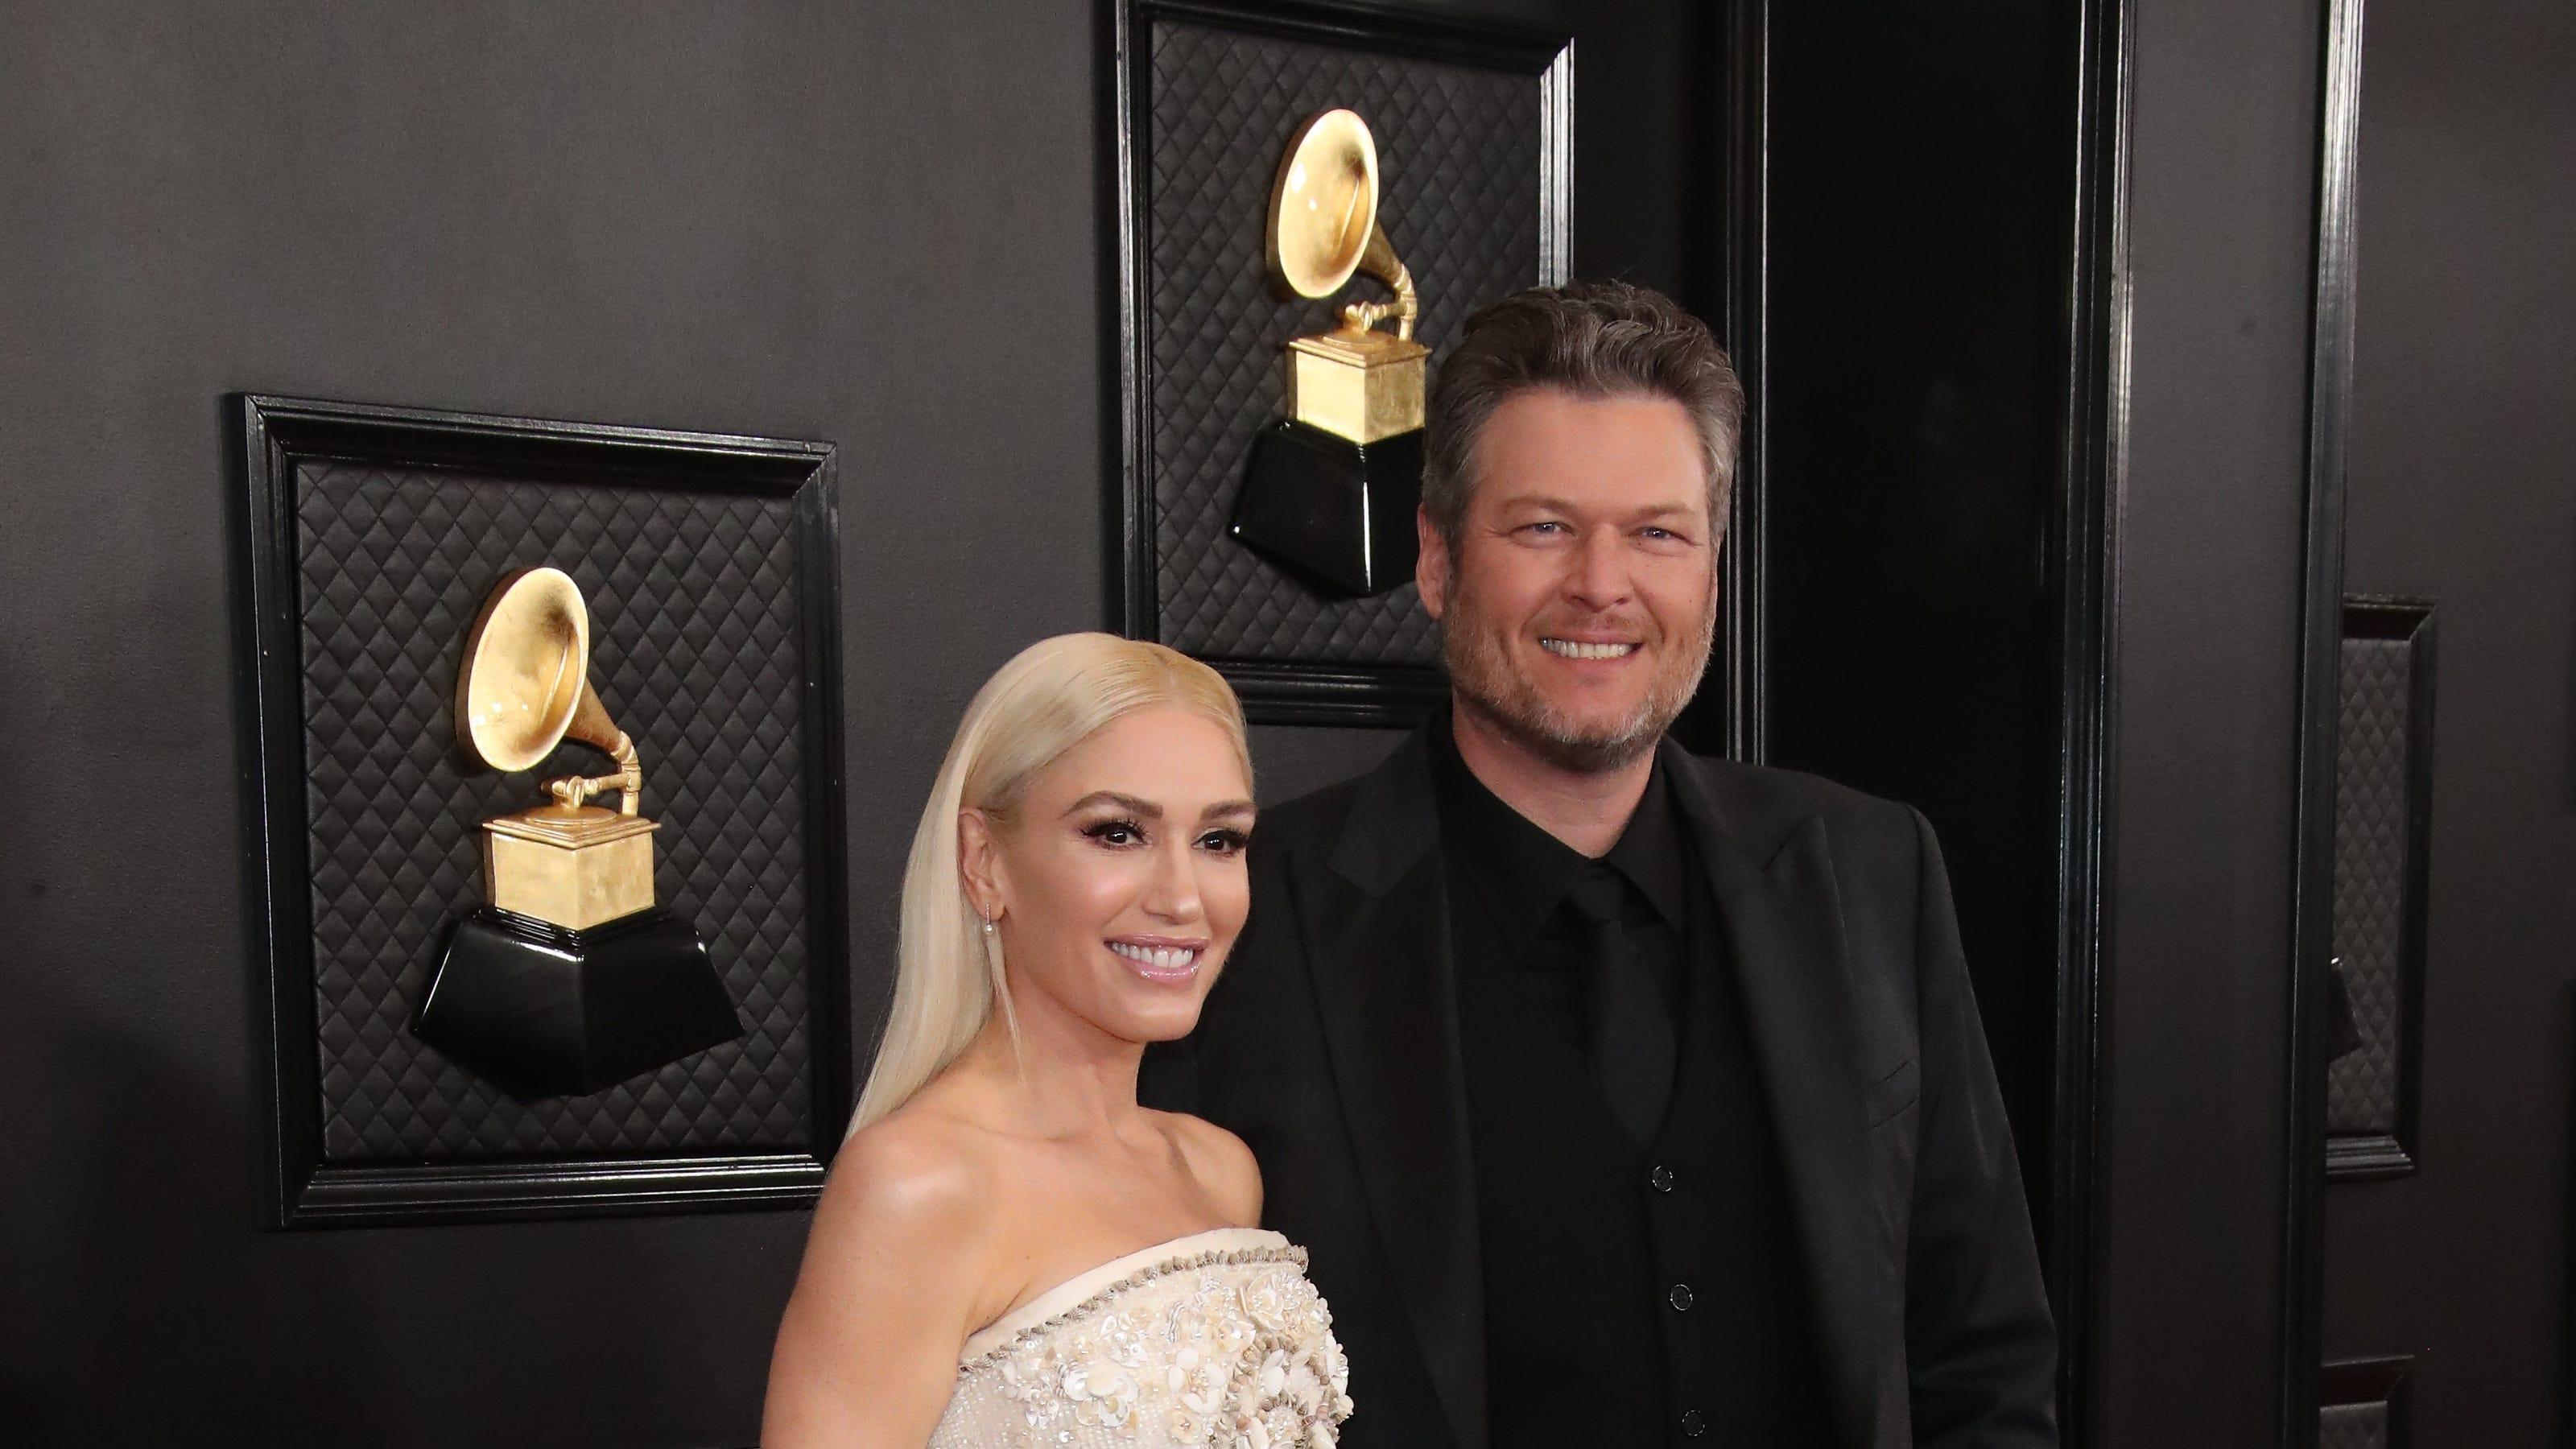 26e1c737 017f 44c9 b044 e11f40f93896 XXX Entertainment  62nd Annual Grammy Awards 20200126 USA djm 0 7 JPG?crop=3647,2051,x0,y0&width=3200&height=1800&format=pjpg&auto=webp.